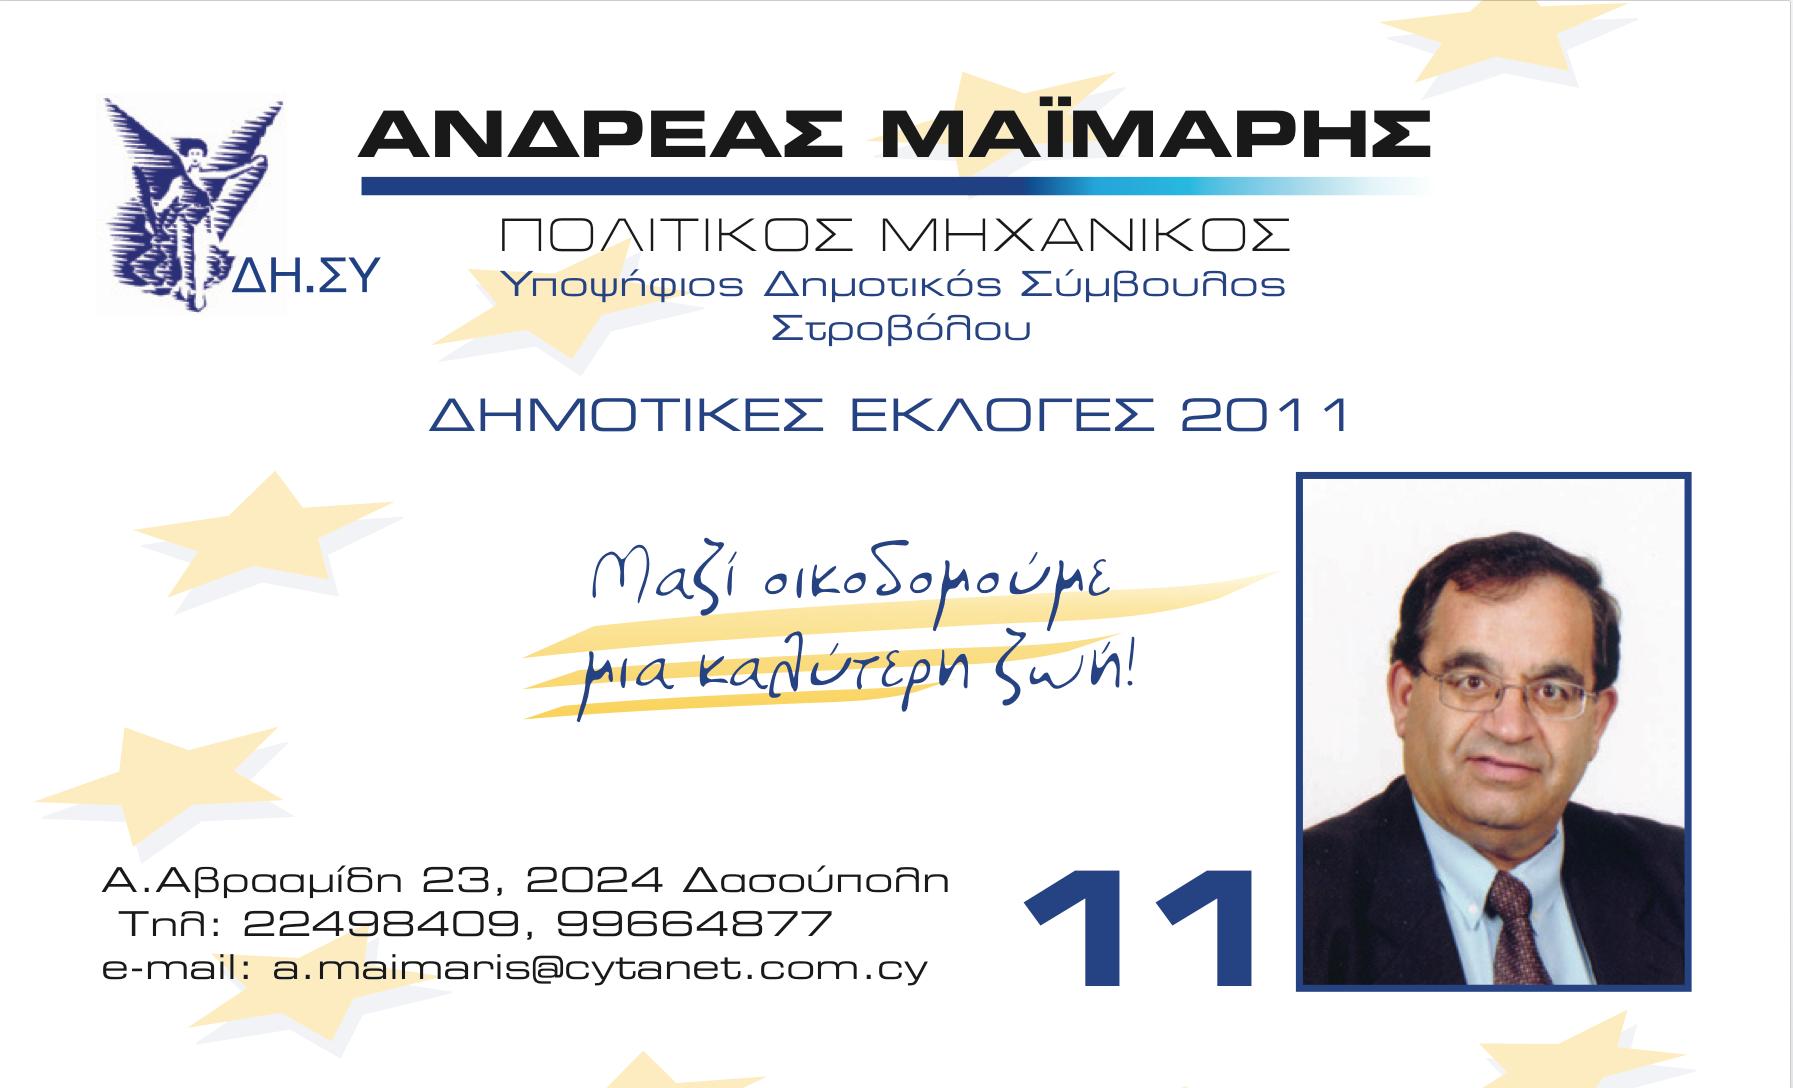 Andreas Maimaris Business Card